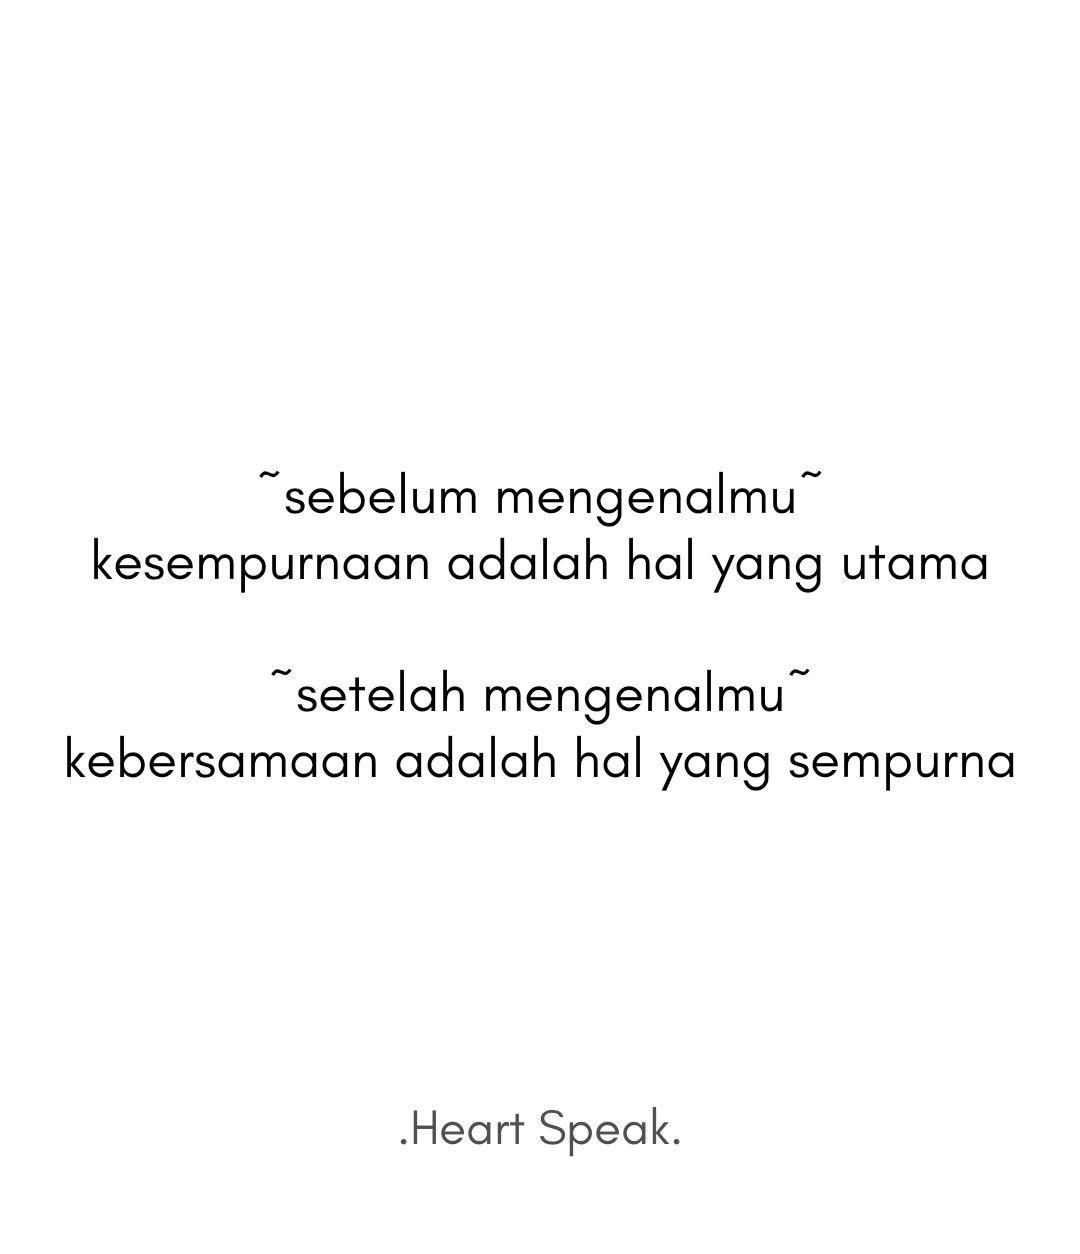 Senang banget deh kalau kamu mau berkenan untuk klik gambar  dan klik skip di iklannya. . . . . . . . . sedih senang bahagia curhat cemburu kesepian sarcasm kutipan quote quotesindonesia bahasa curahanhati puisi galau story love broken heart young lovestory Tag: #sedih #senang #bahagia #curhat #cemburu #kesepian #sarcasm #kutipan #quote #quotesindonesia #bahasa #curahanhati #puisi #galau #story #love #broken #heart #young #lovestory Kata Bijak Cinta daftar-daftar-daftar.blogspot.com